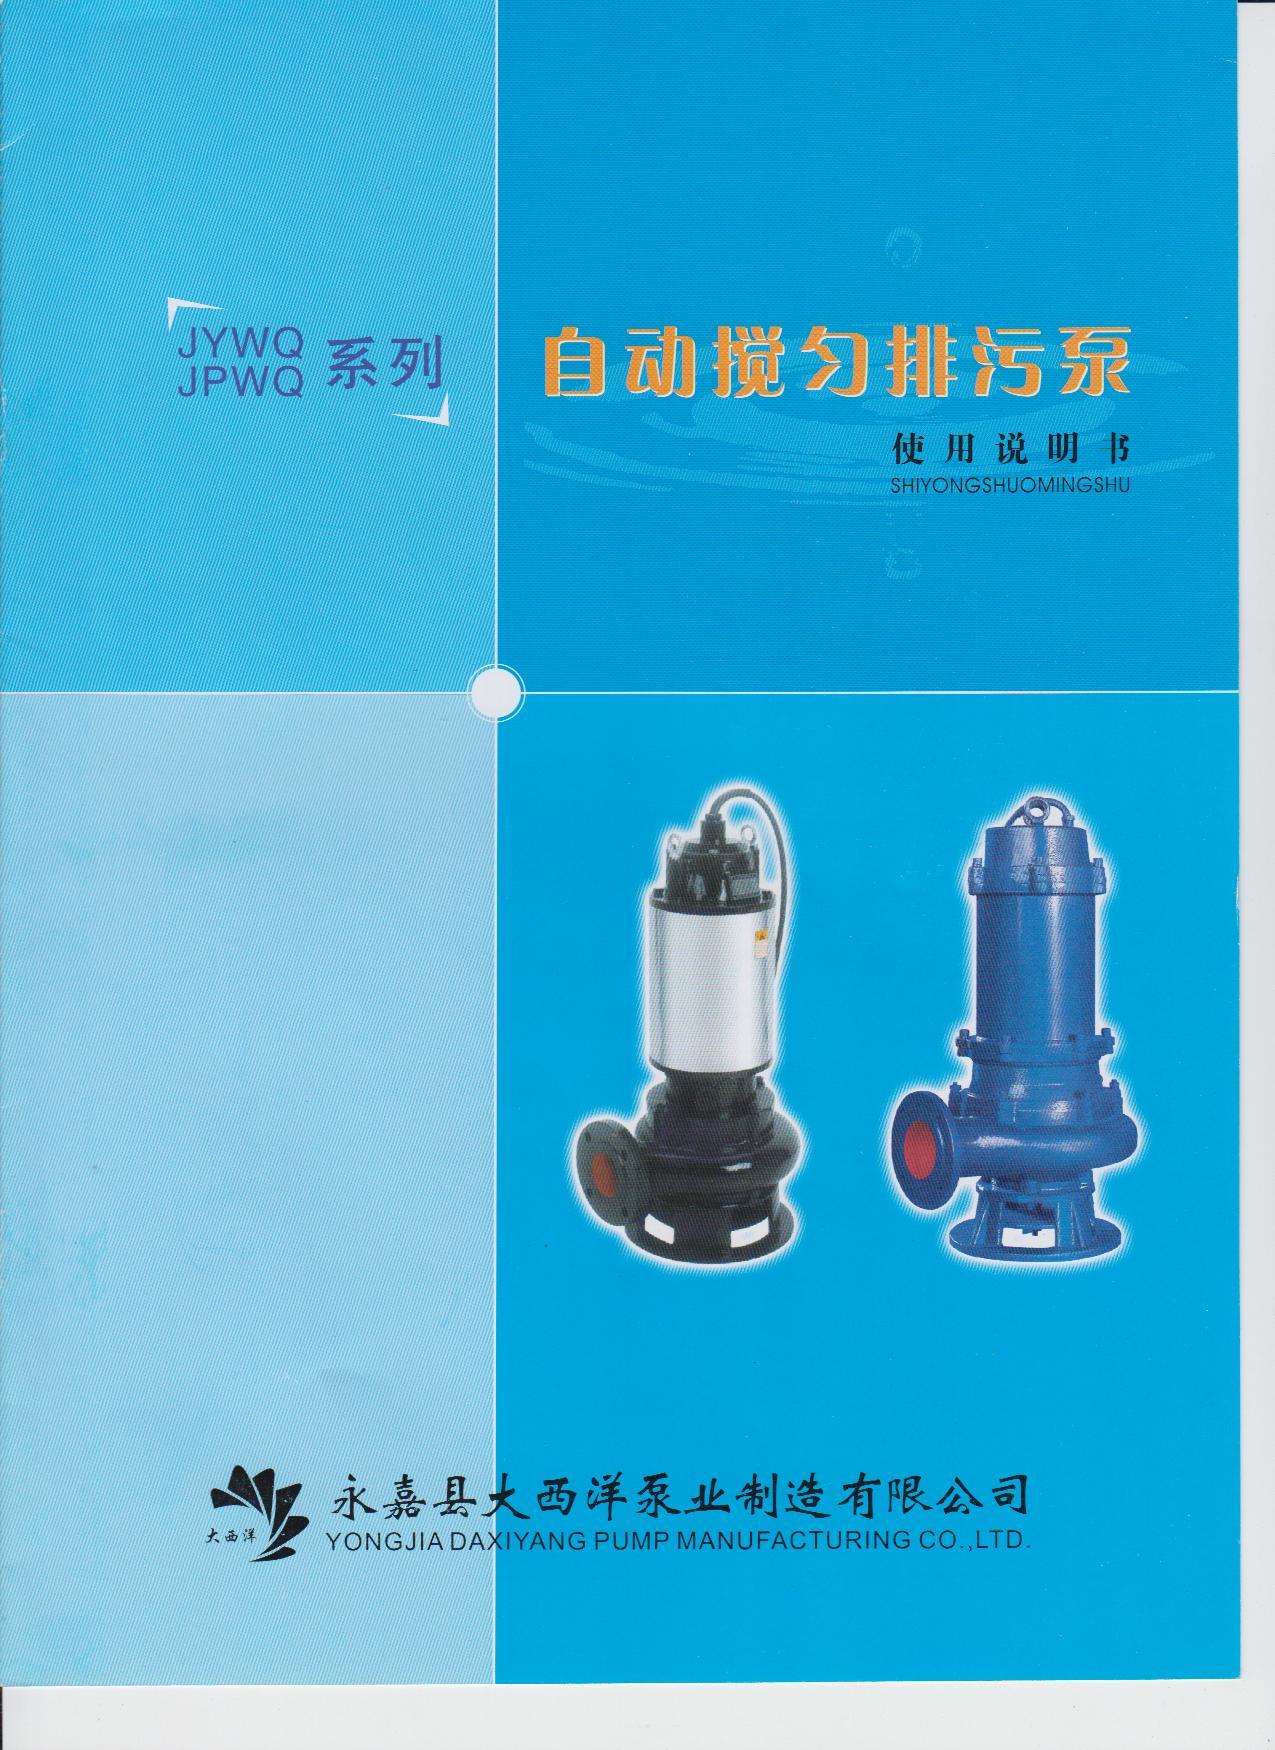 JYWQ搅匀式排污泵性能参数及产品介绍